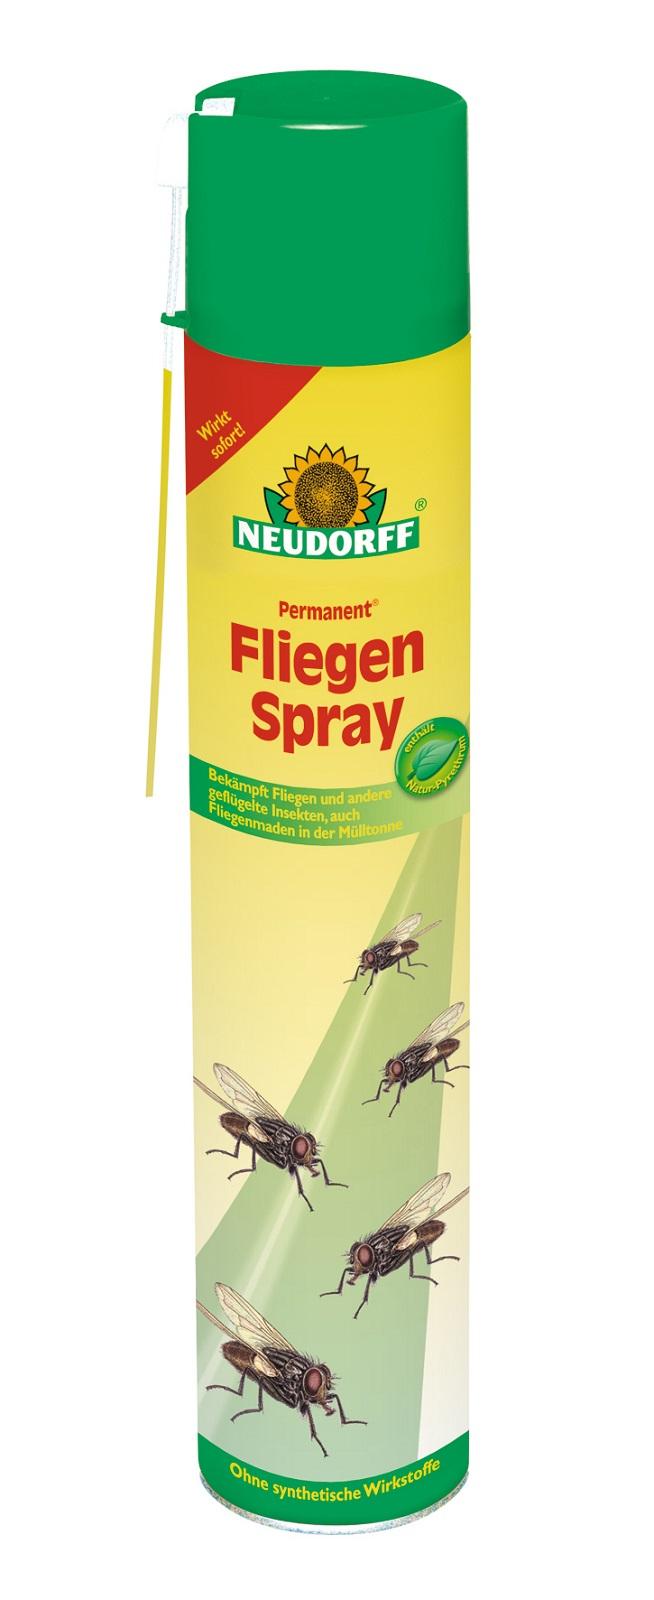 Neudorff  Permanent Fliegenspray 750 ml Fliegenbekämpfung